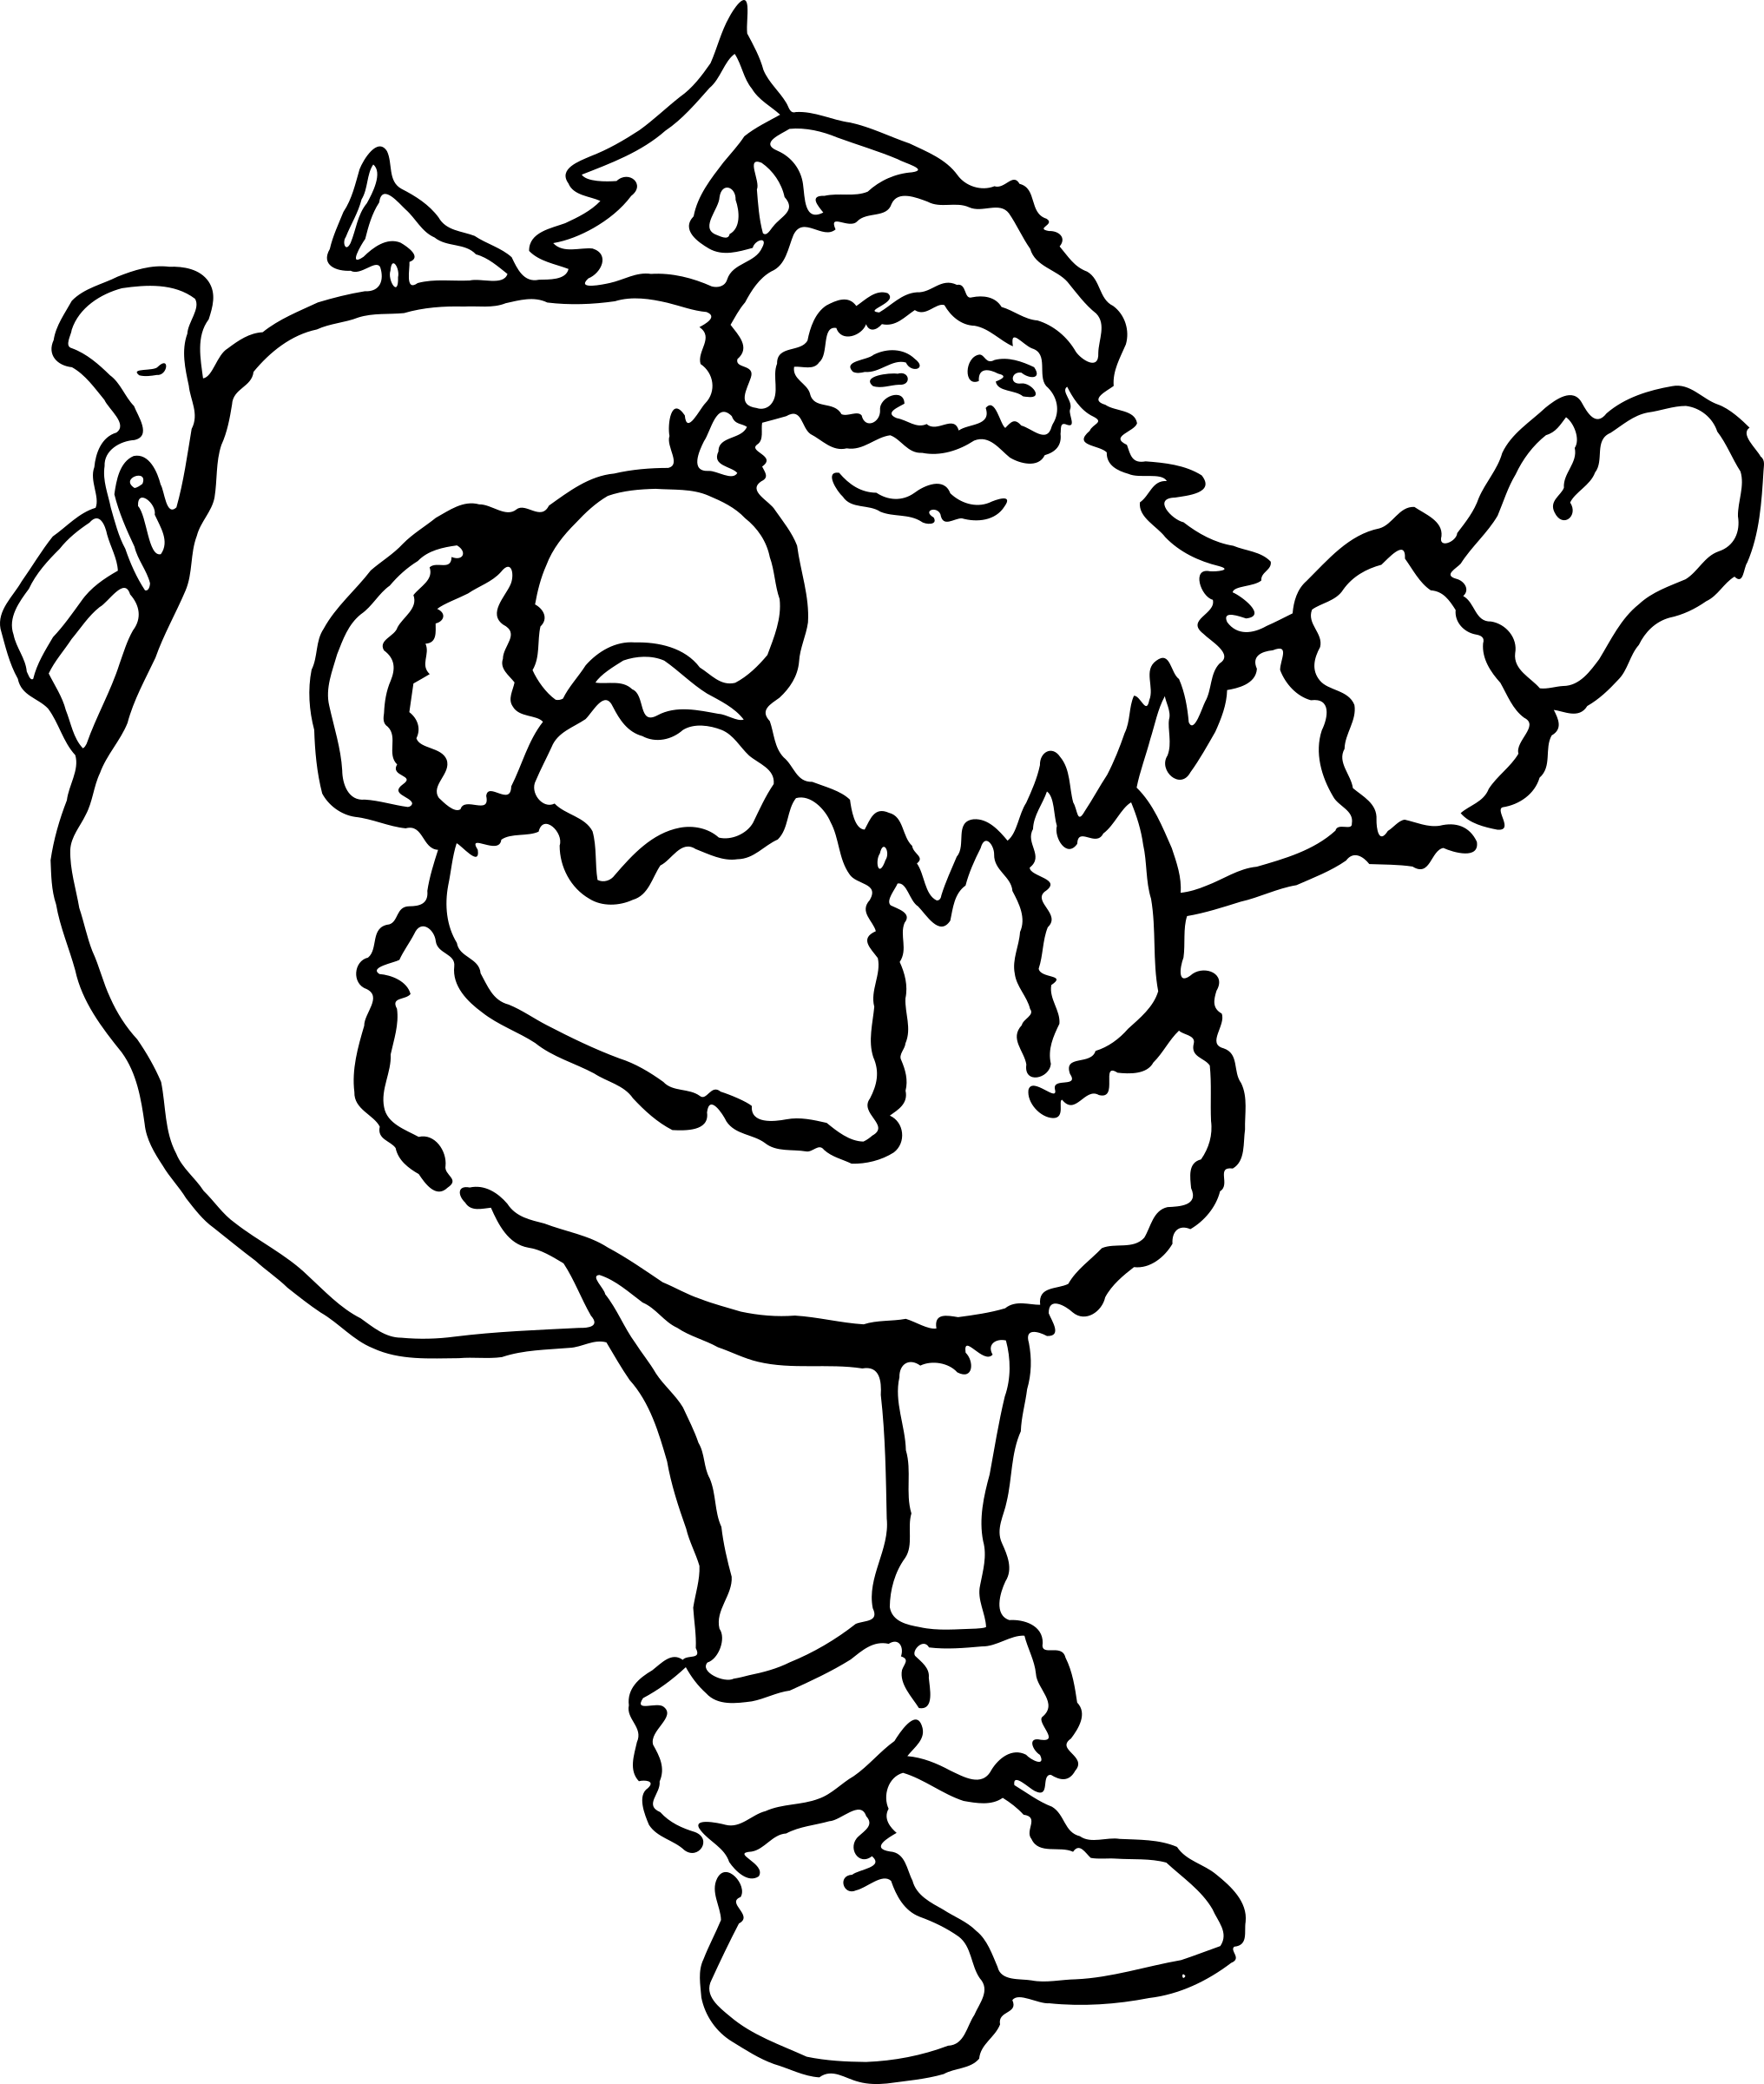 2032x2400 Clipart